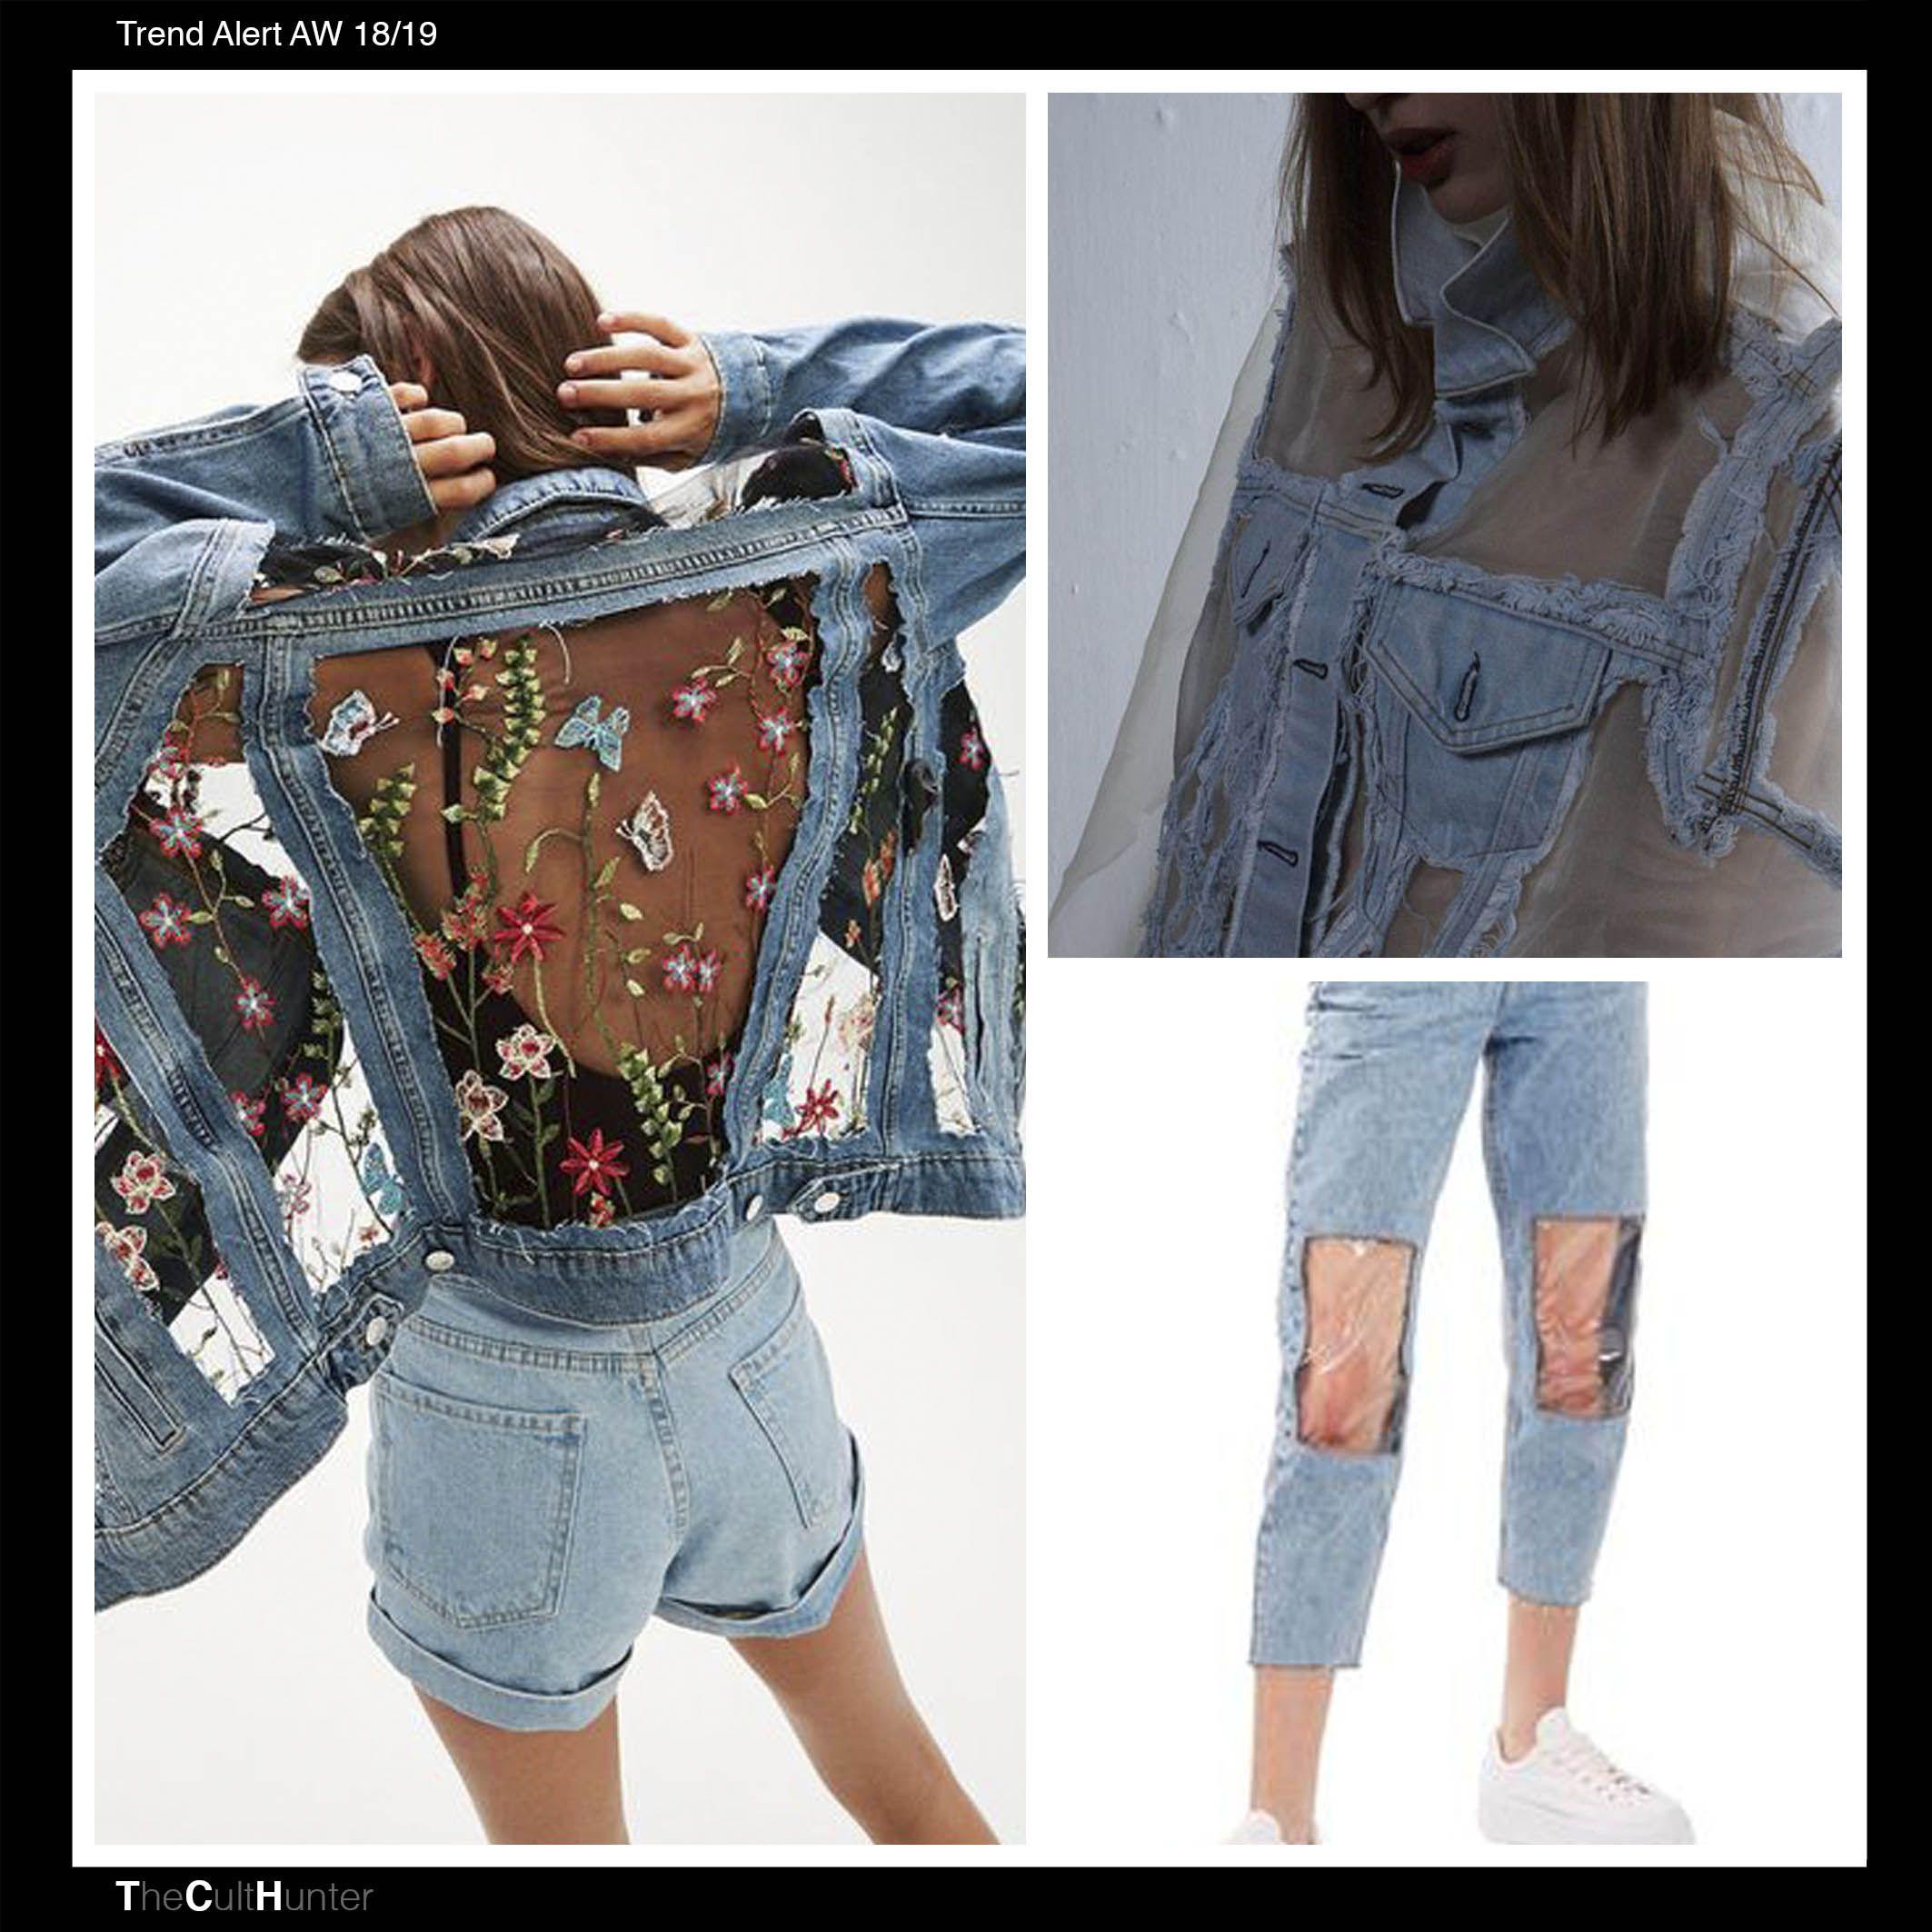 Tendencias Denim 18/19 | Moda otoño invierno 2018 | Pinterest